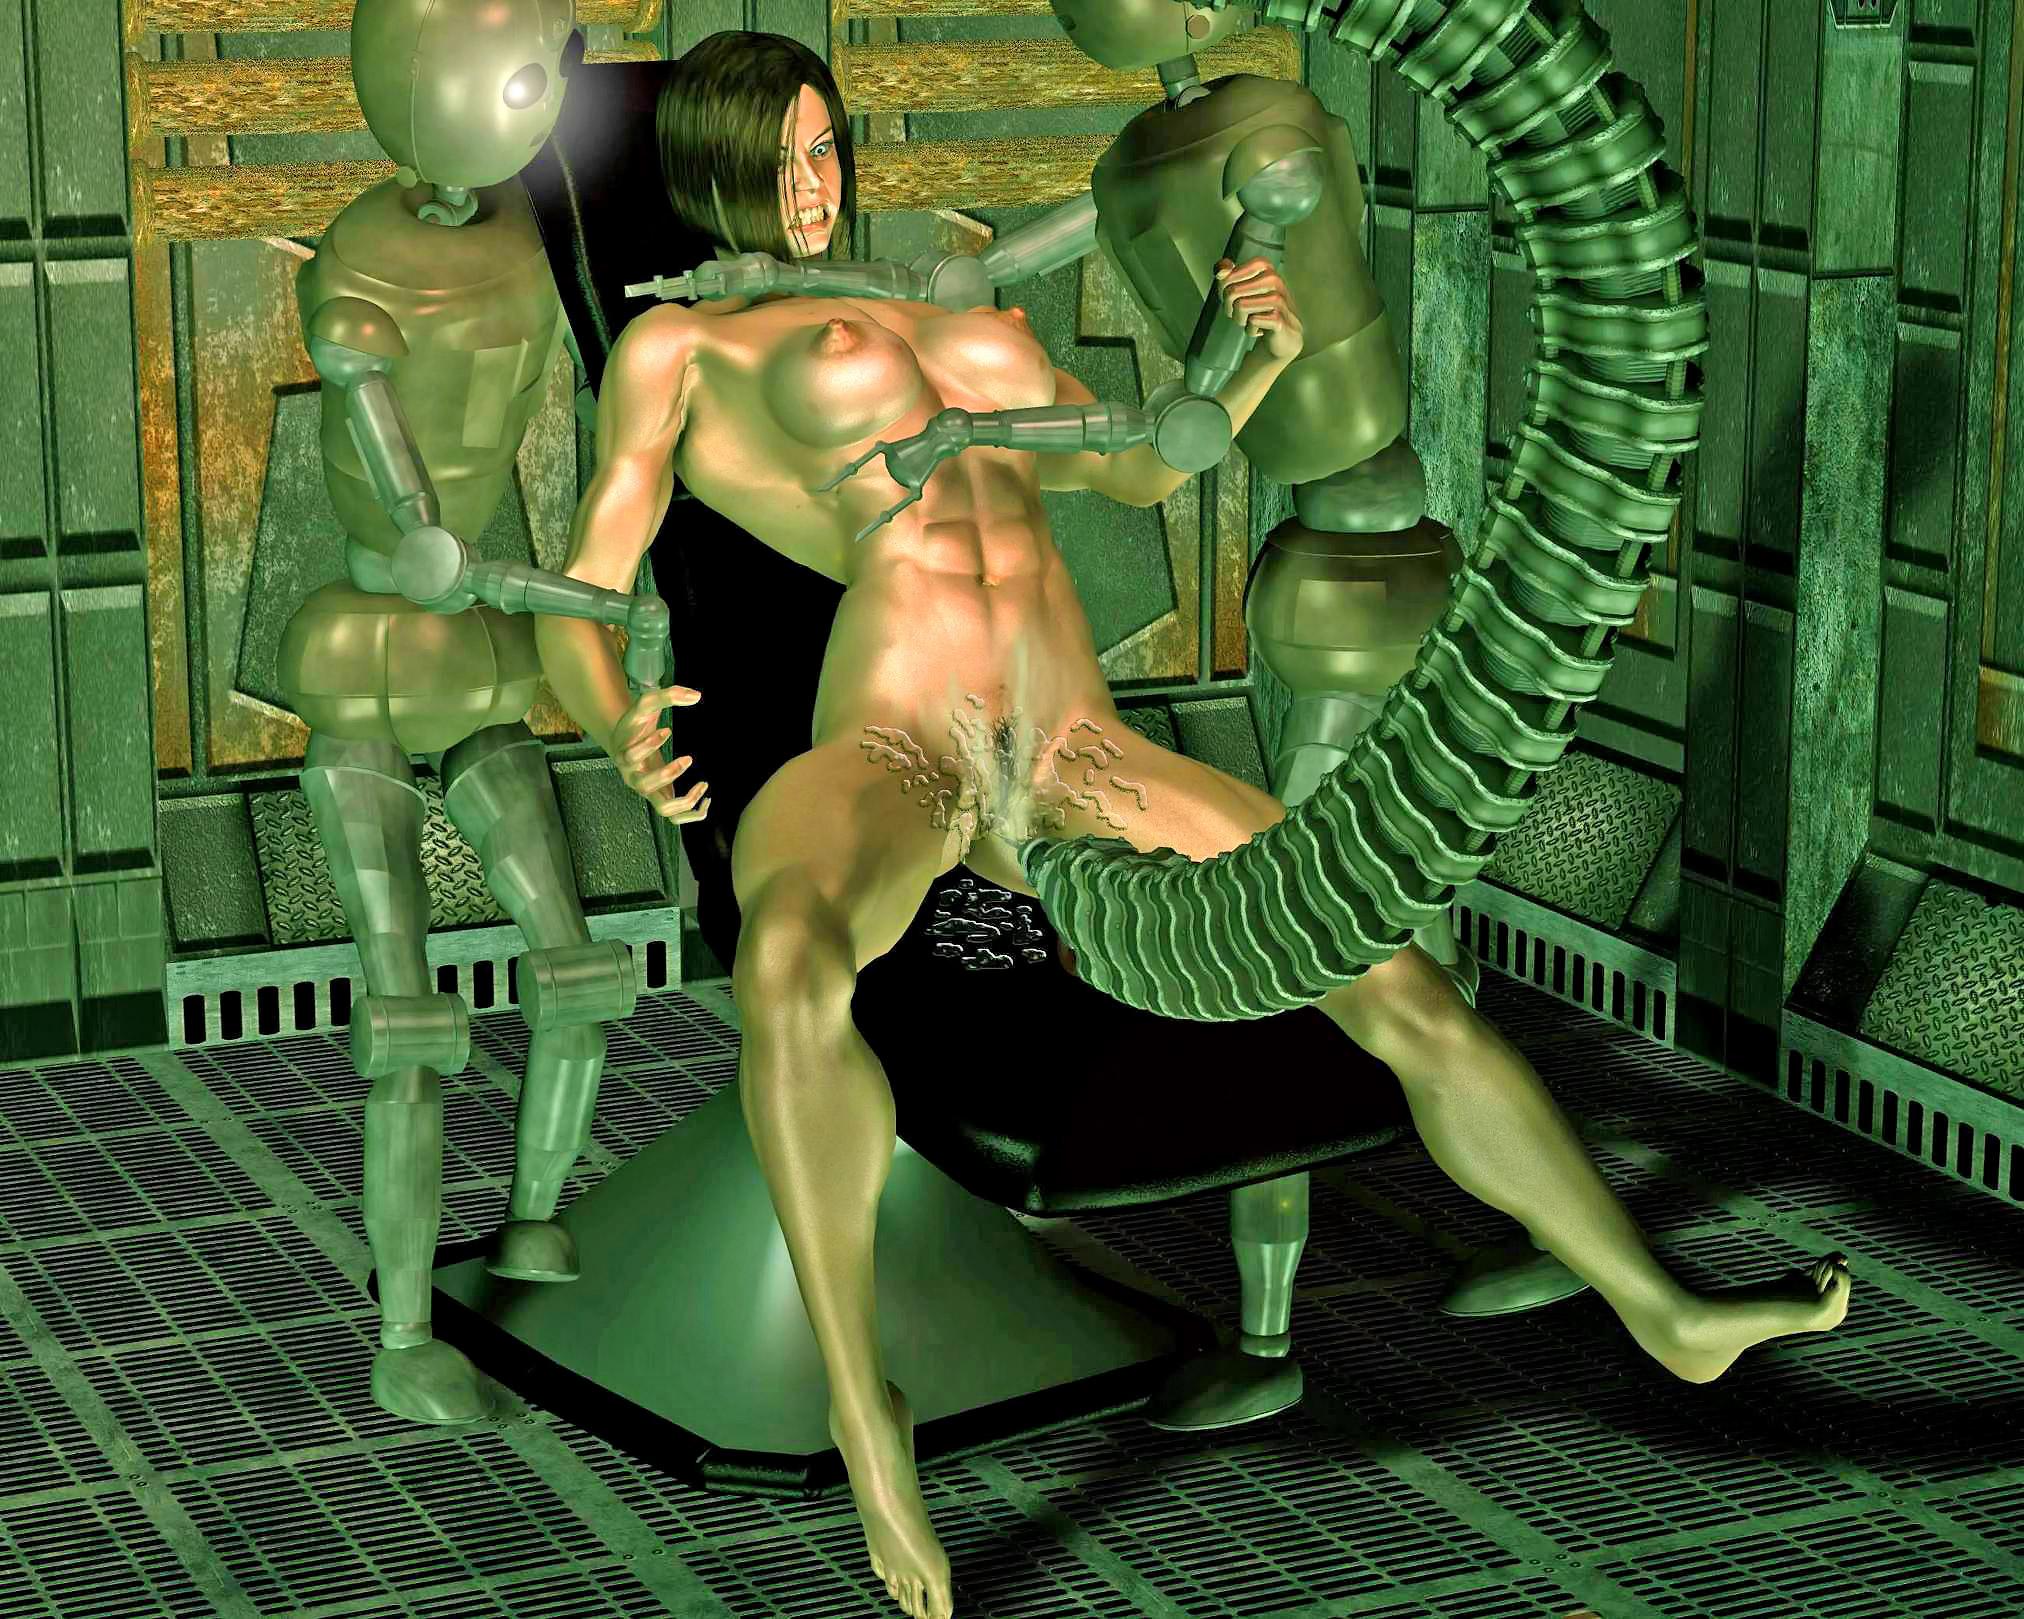 Alien slime porn hentai gallery